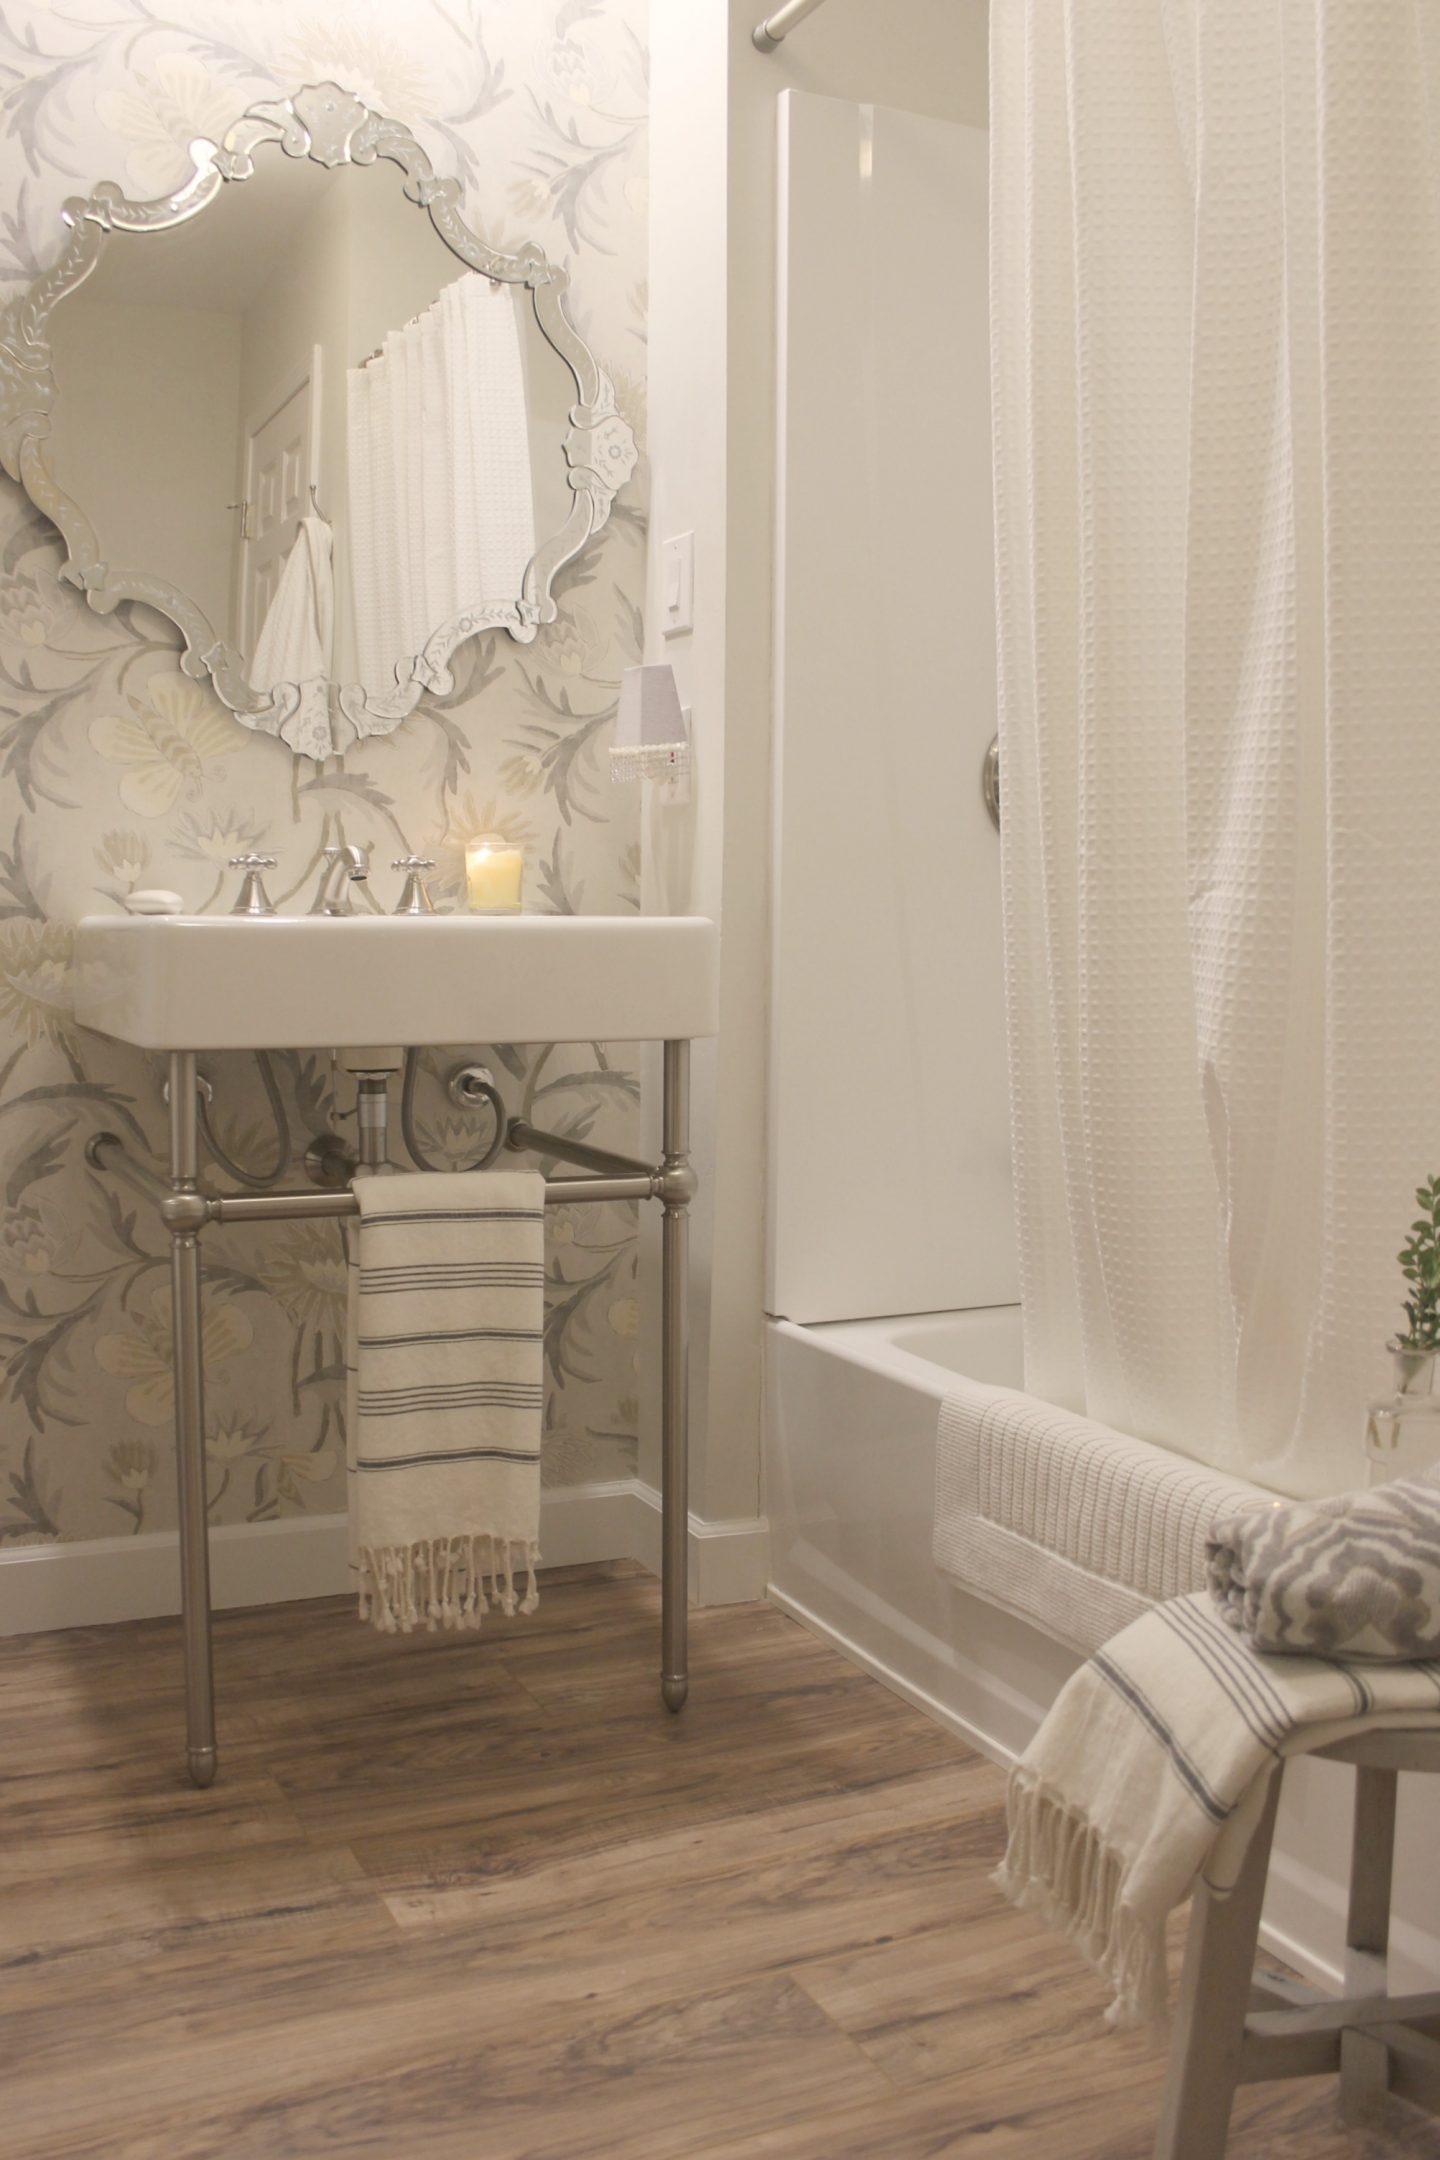 Classic bathroom design with console sink, Venetian mirror, Turkish towel, and wood look floor.